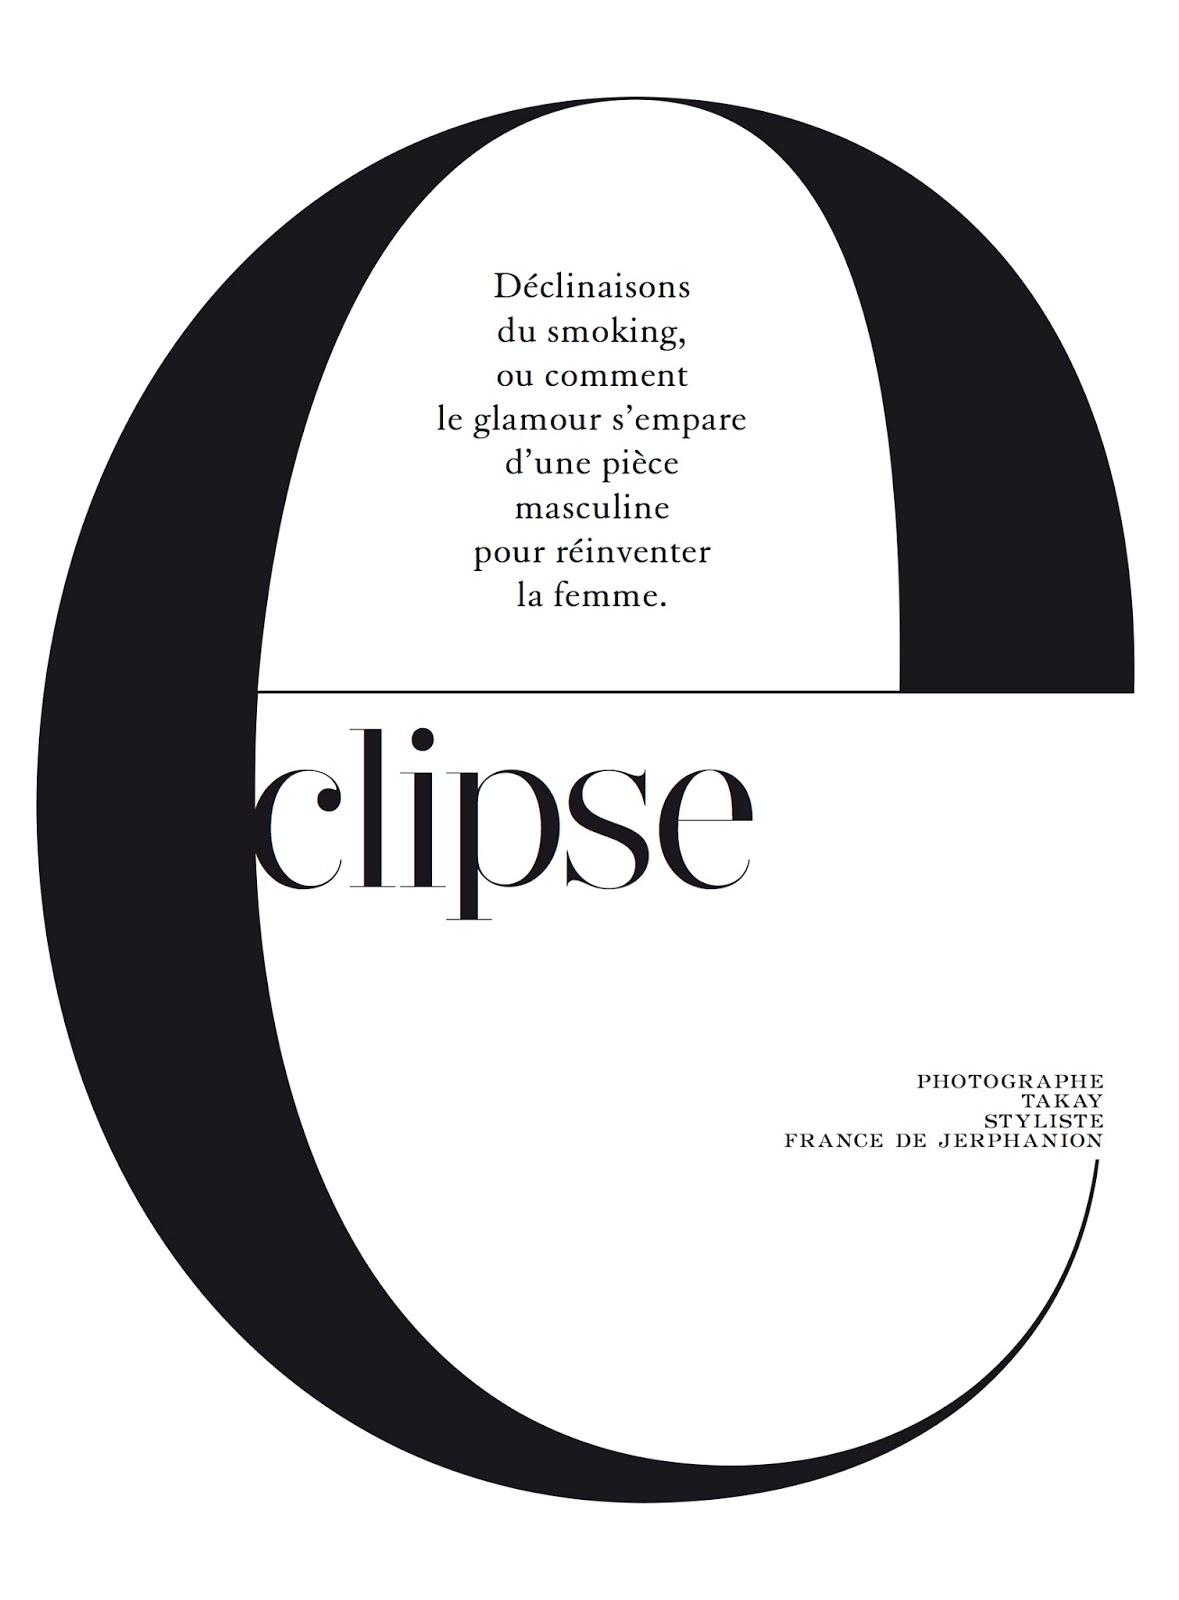 eclipse  alexandra tikerpuu by takay for madame air france